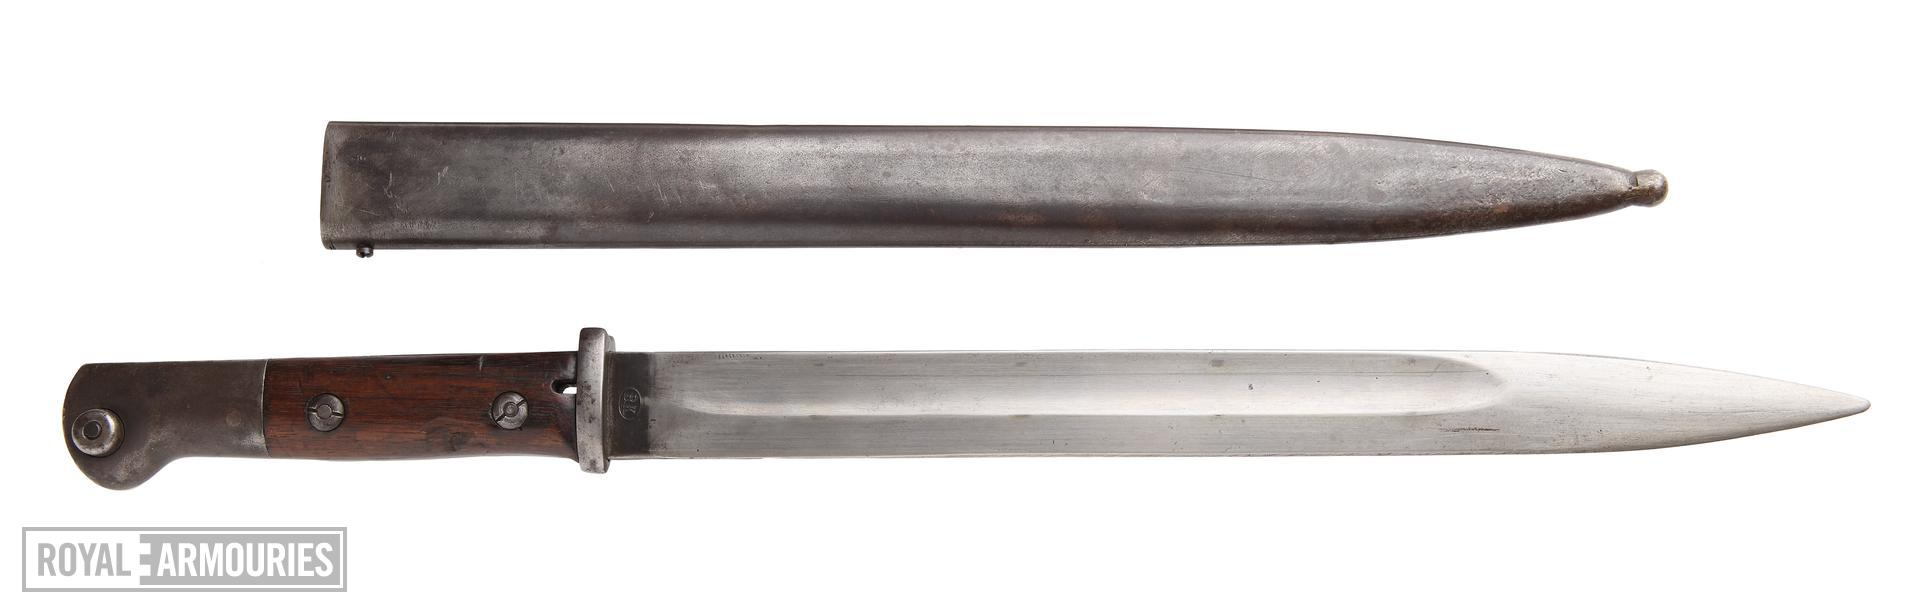 Bayonet - Model 1914 Bayonet Model 1914 for Mauser rifle.